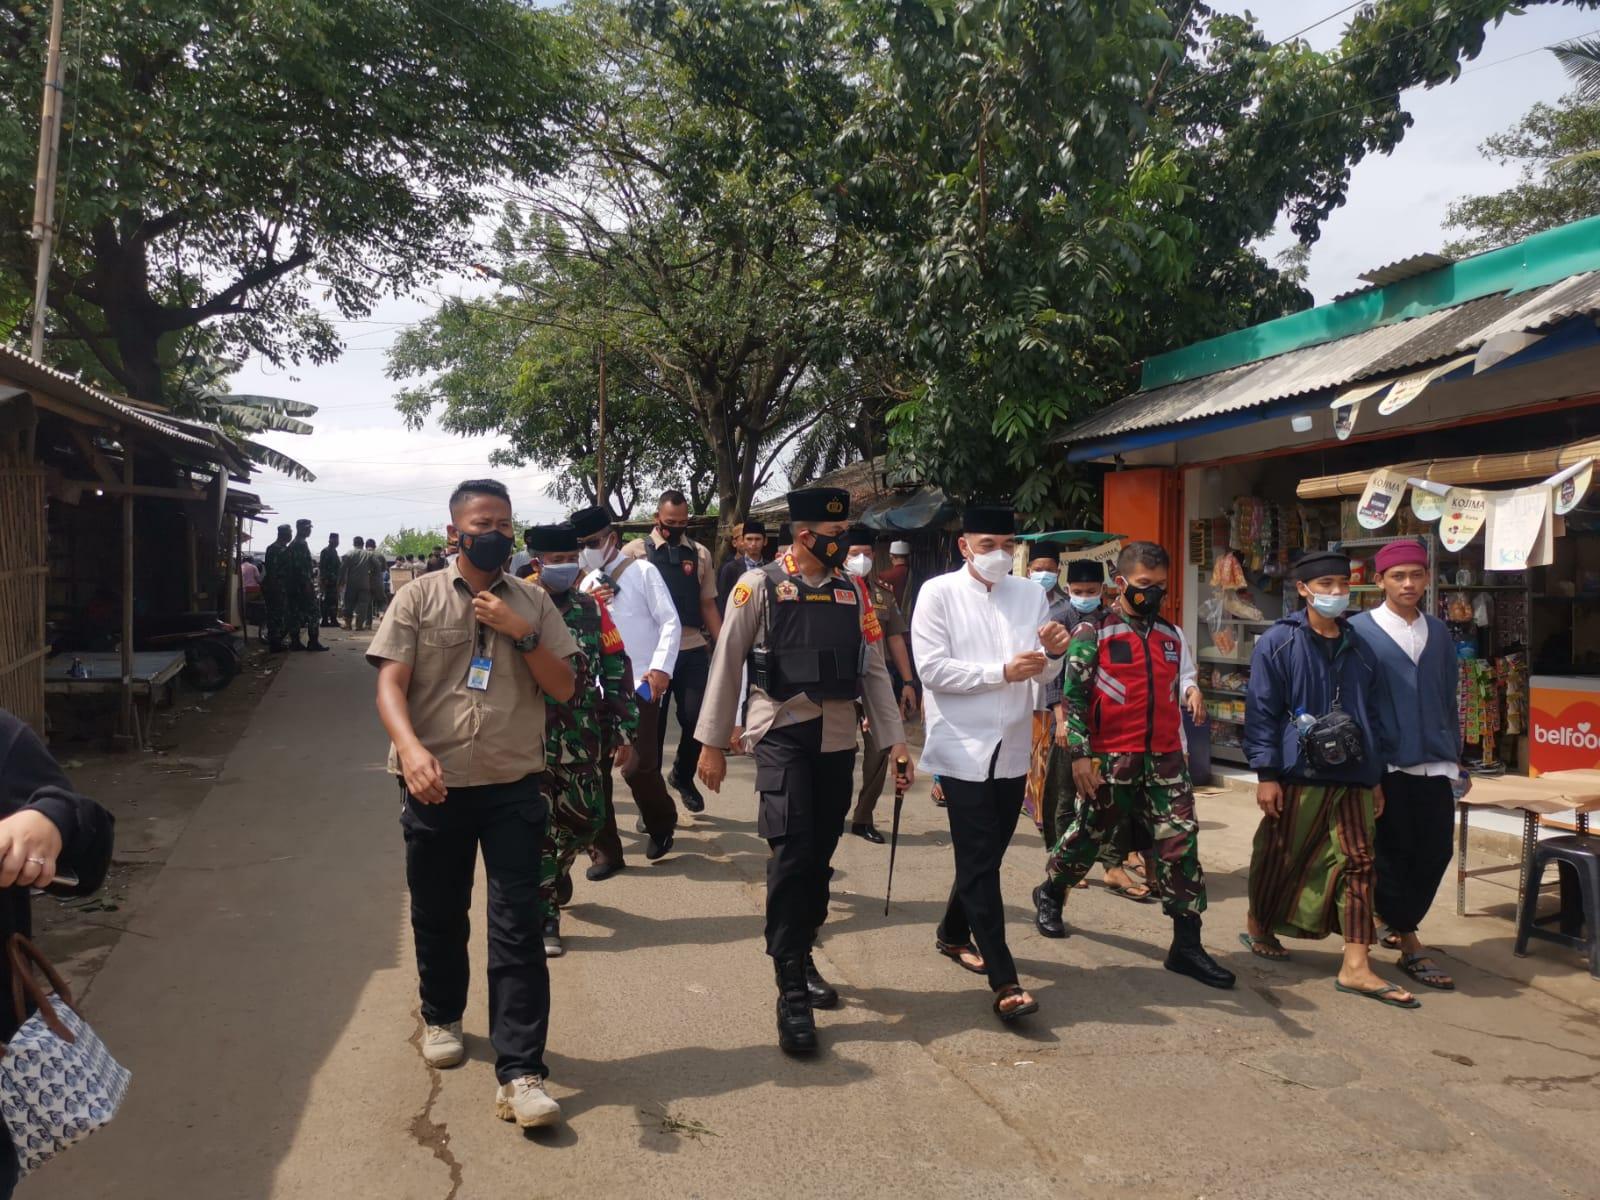 Abuya Uci Wafat, Kapolresta Tangerang Imbau Masyarakat Patuh Prokes, Berdoa dari Rumah